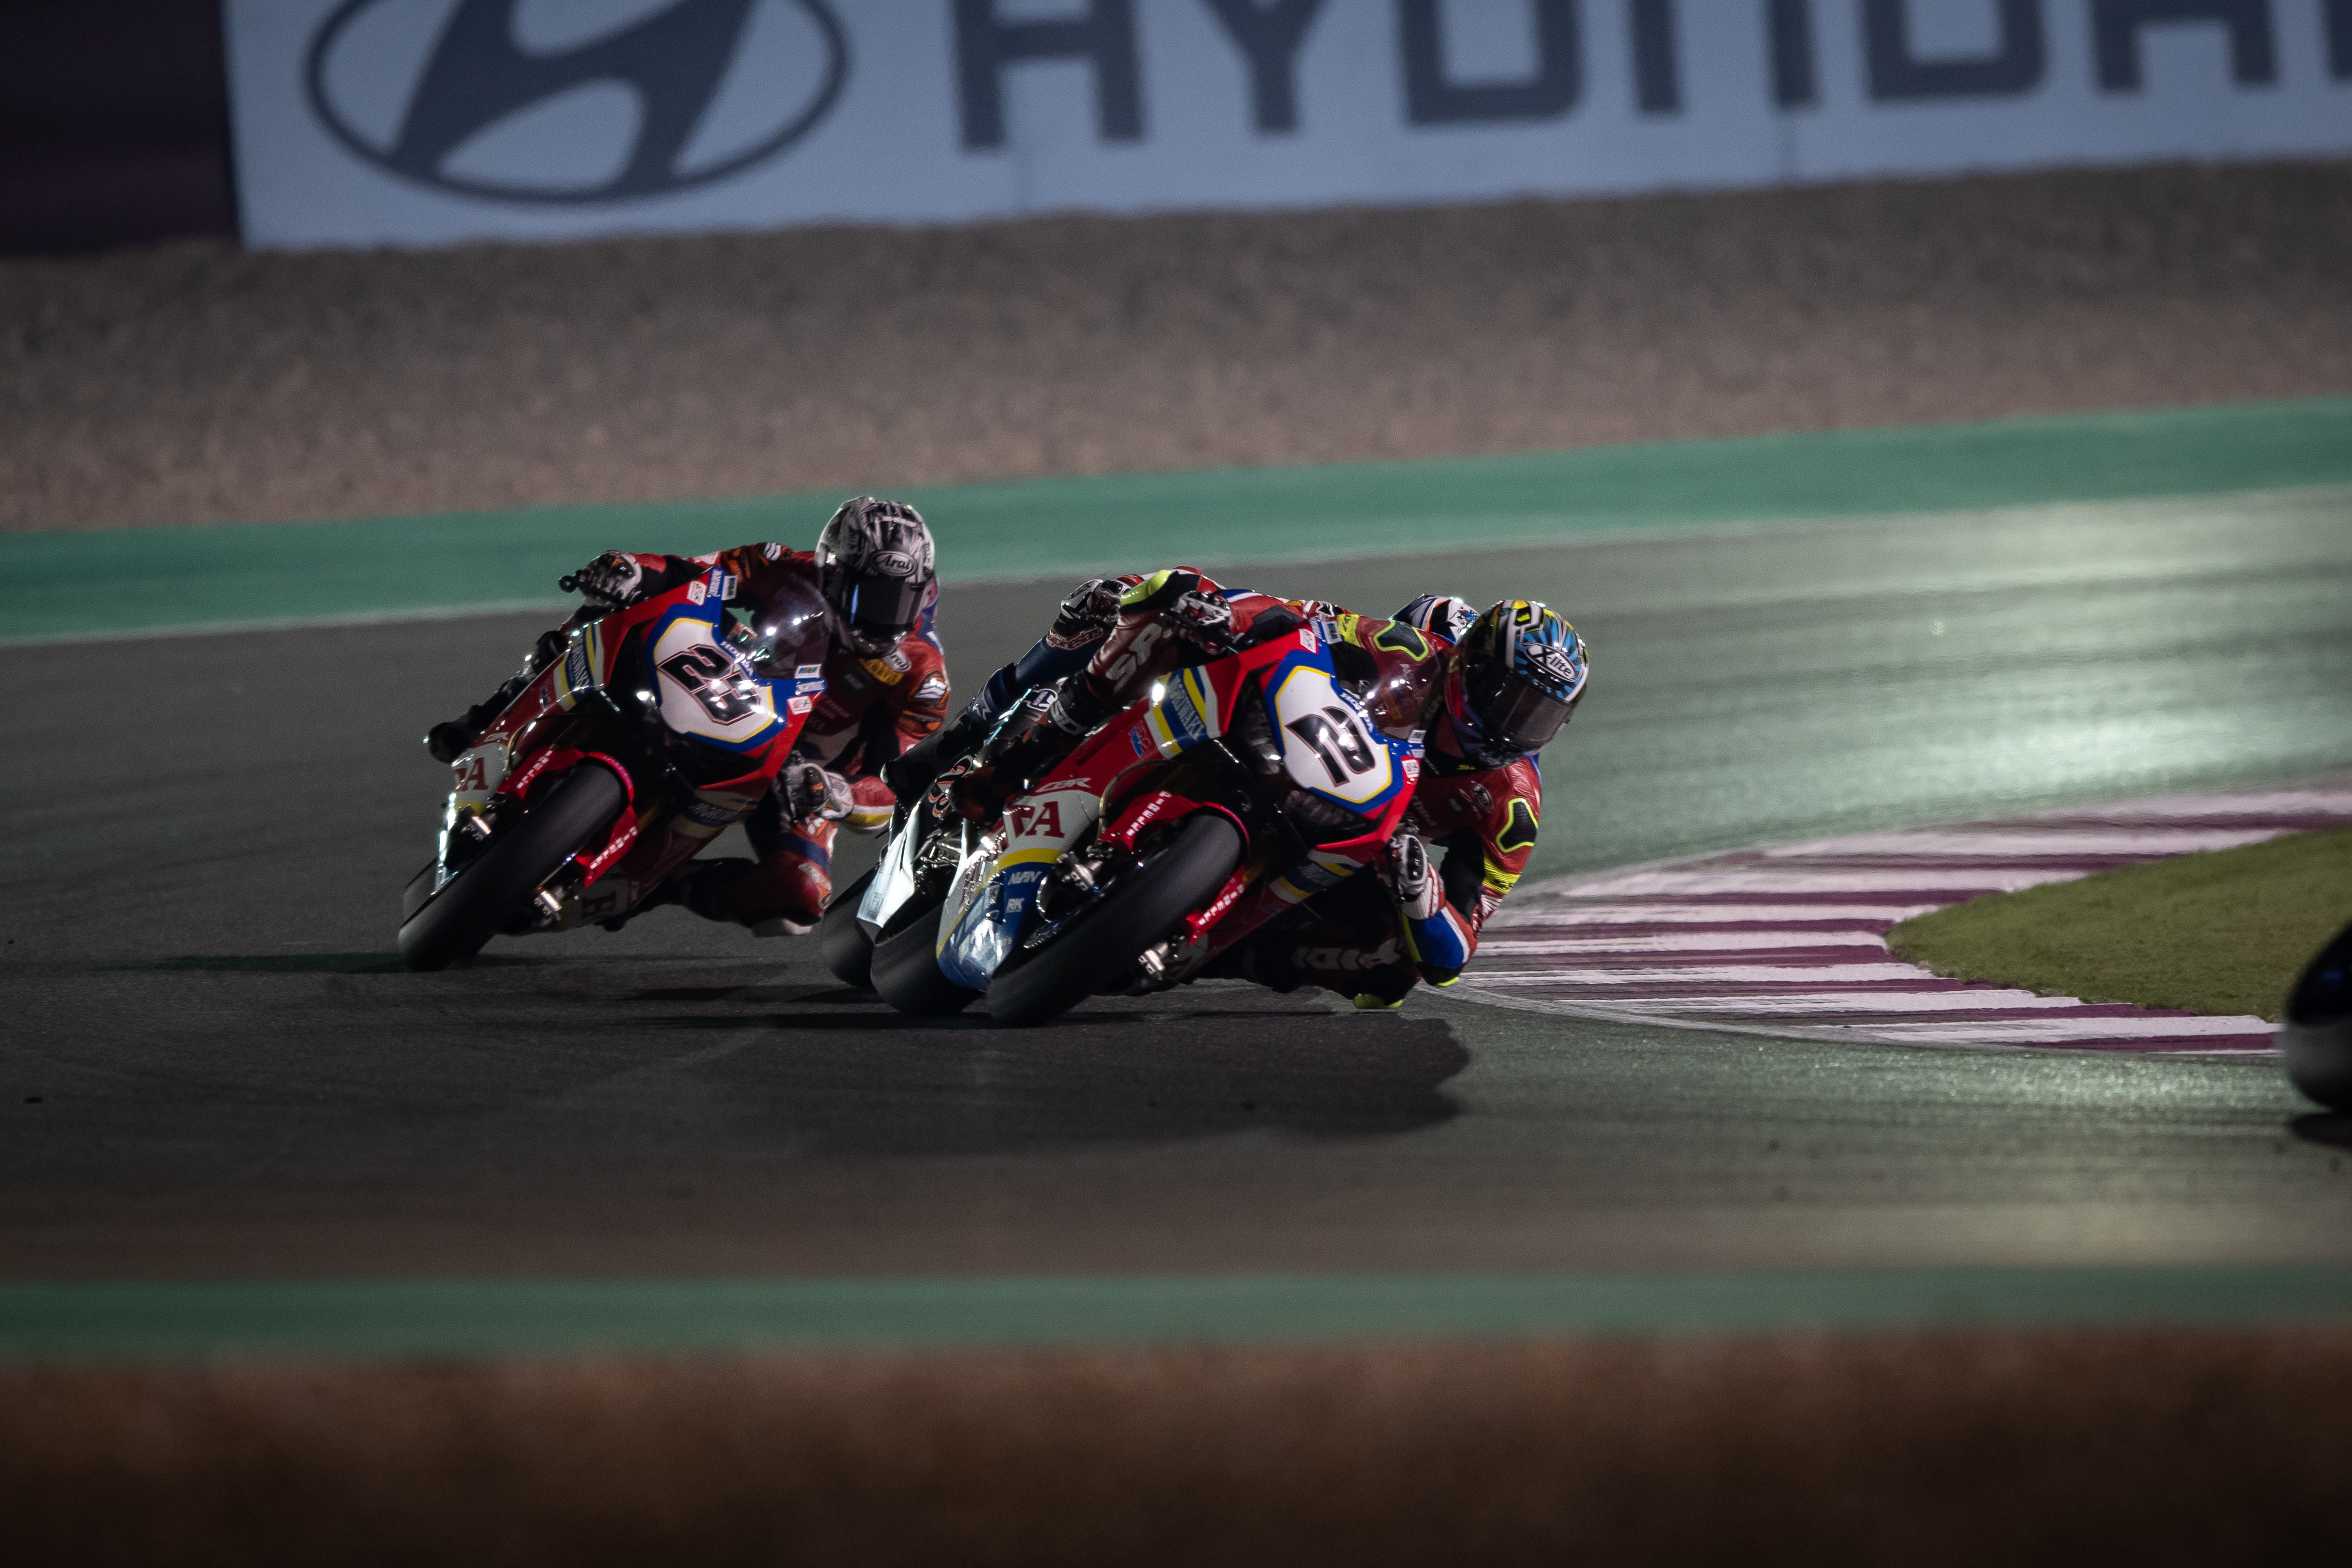 Moriwaki_Althea_Honda_Team_Qatar_367